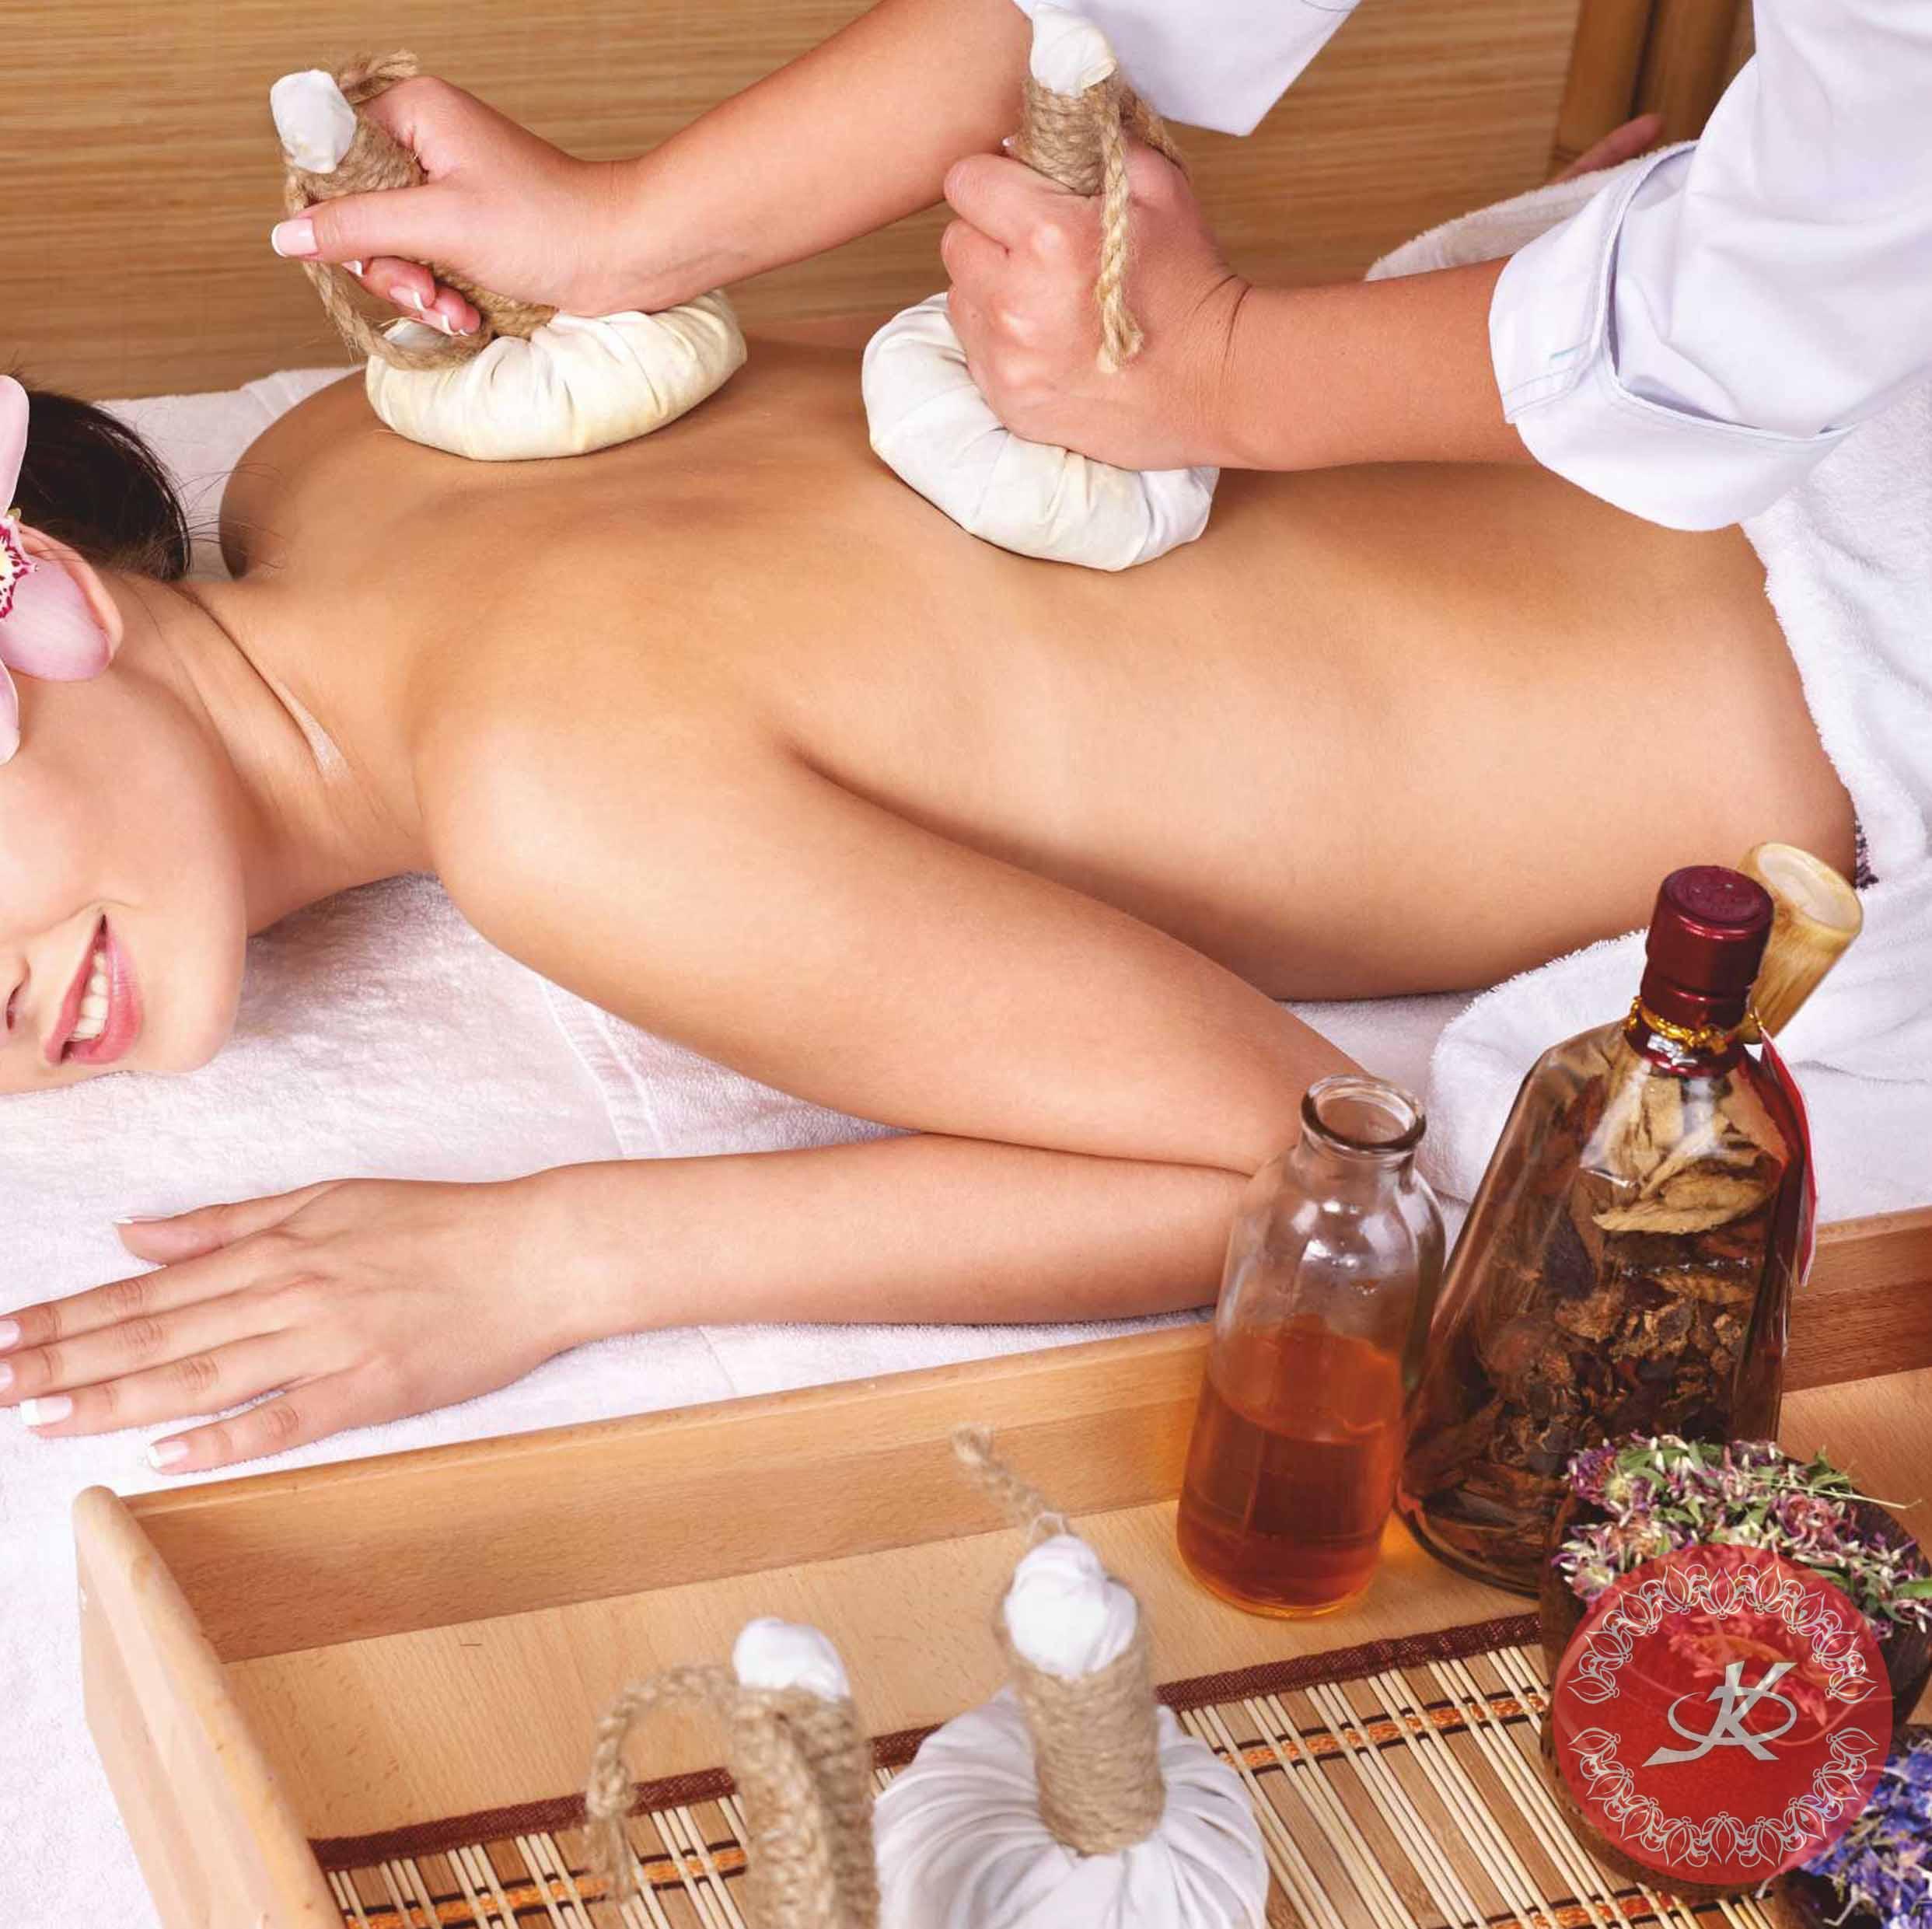 Hills in asian massage auburn